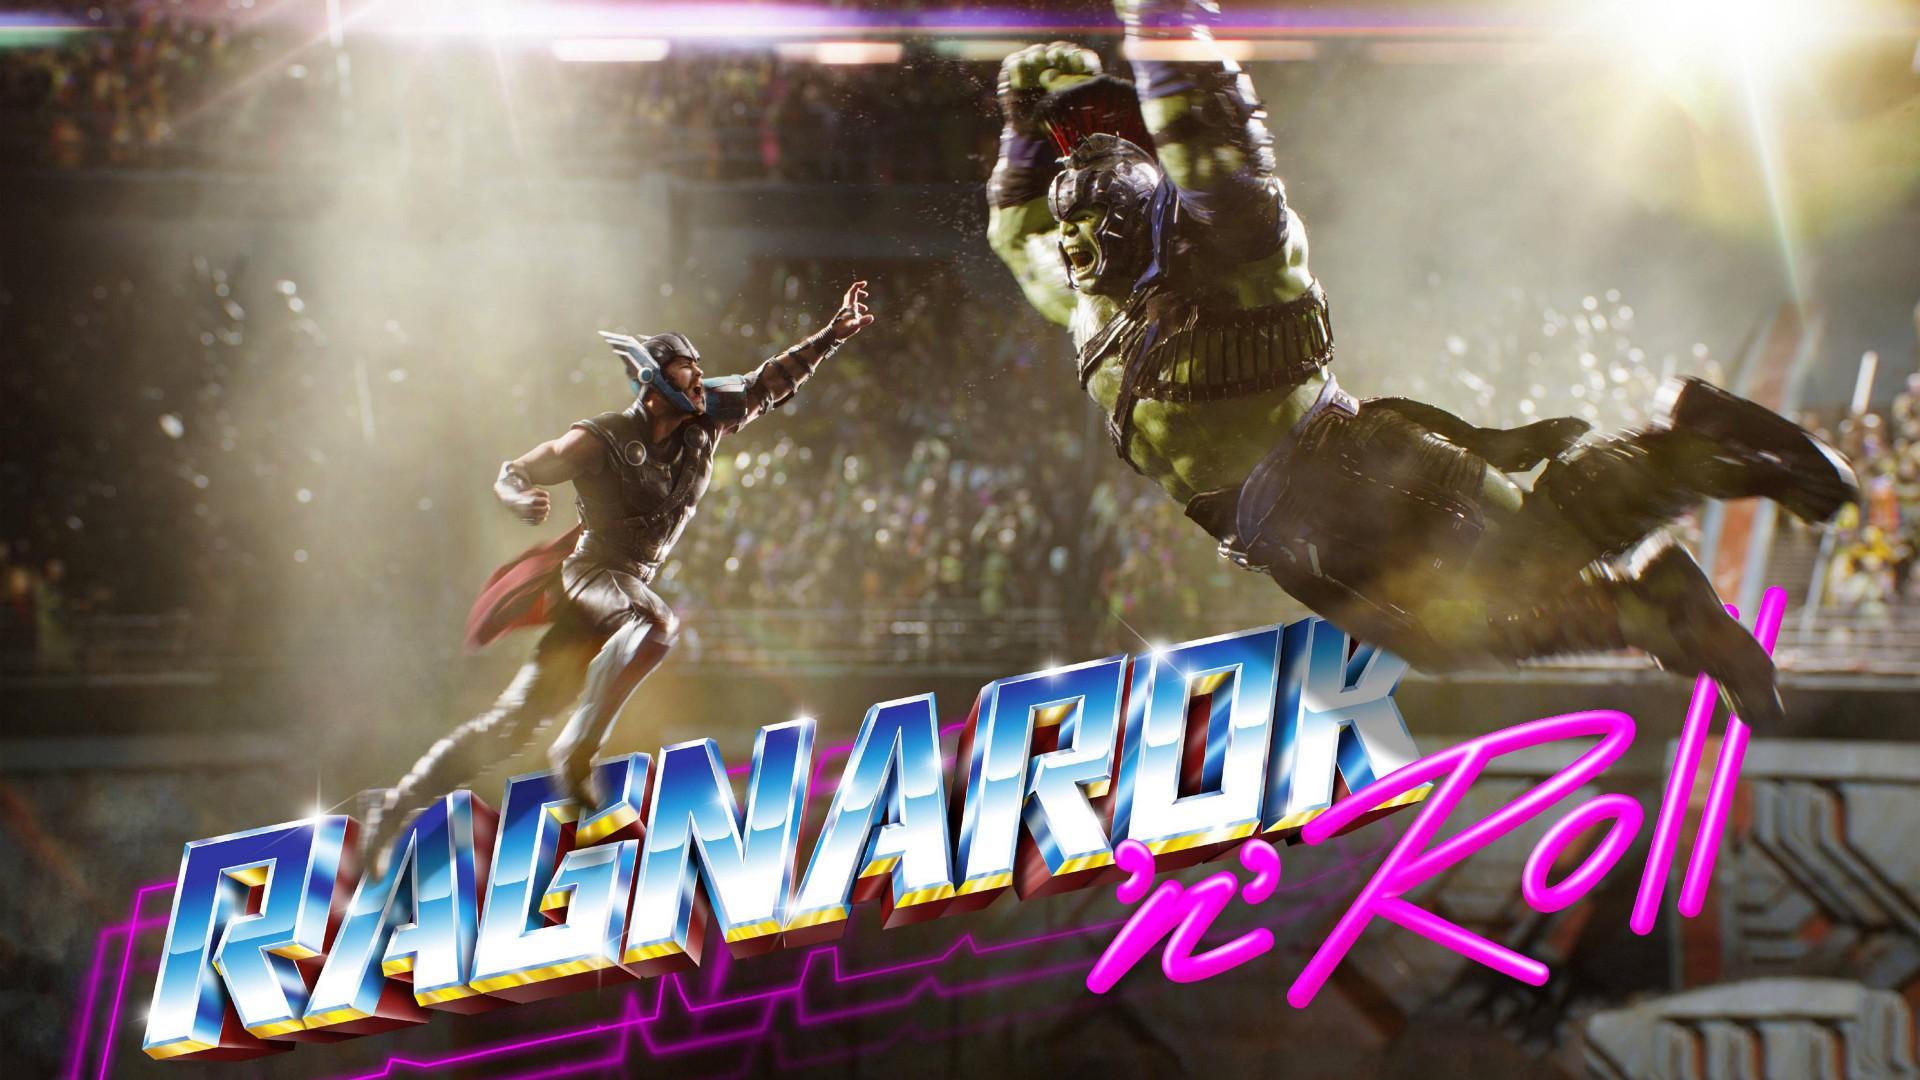 Hd Wallpapers 1080p Windows Thor Ragnarok Hulk 4k Wallpapers Hd Wallpapers Id 21103